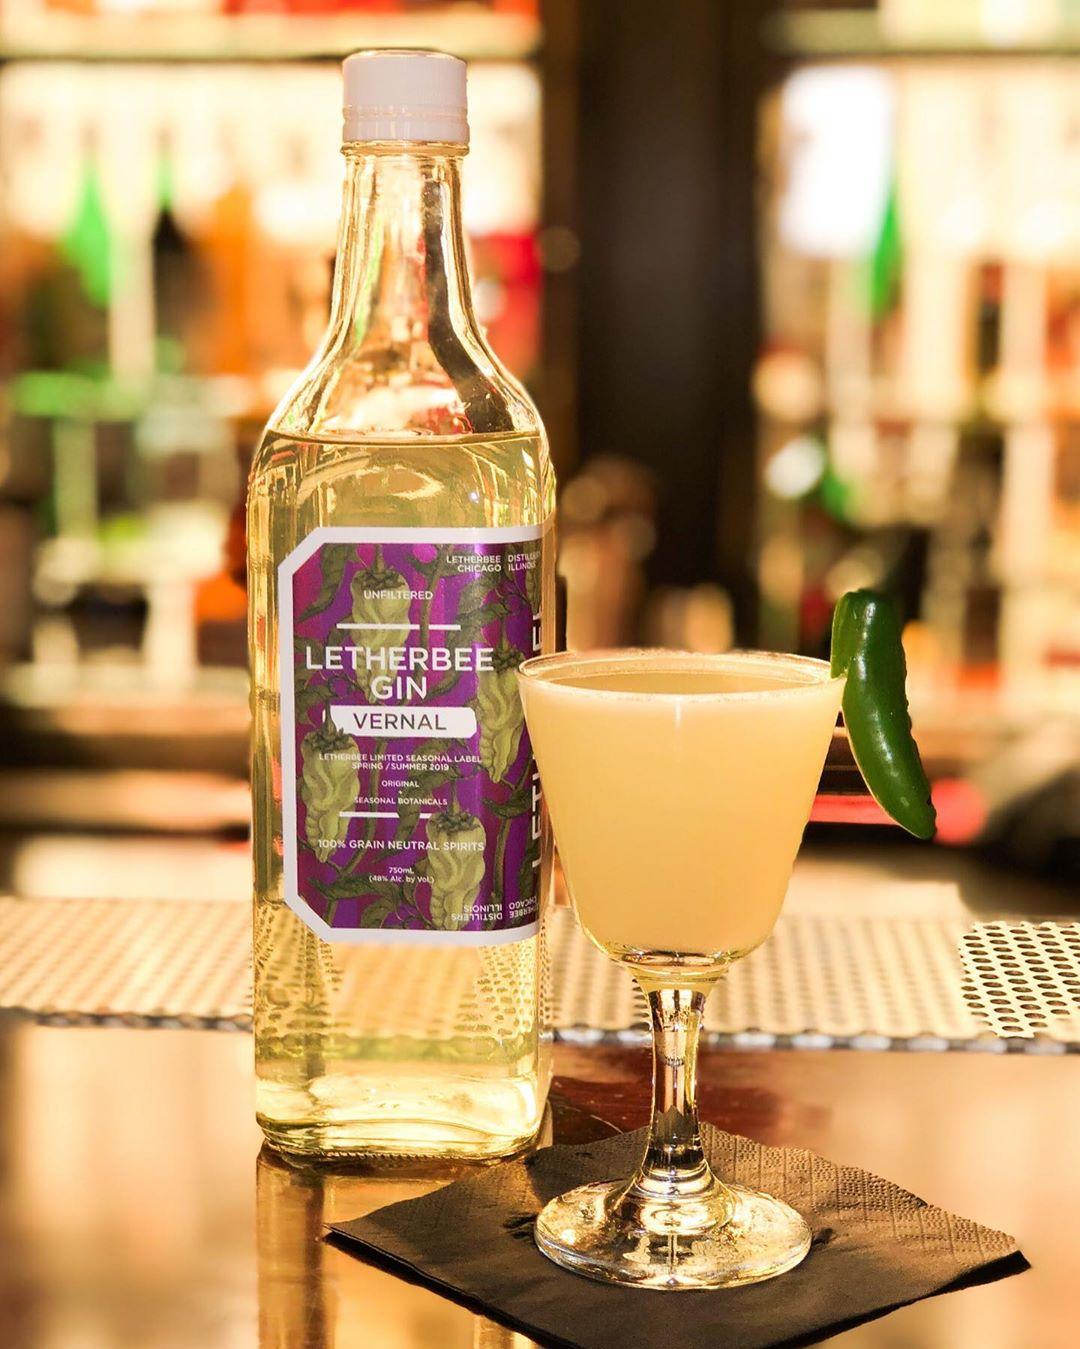 Letherbee Vernal Gin moodshot - 4款辣酒,让你越喝越过瘾